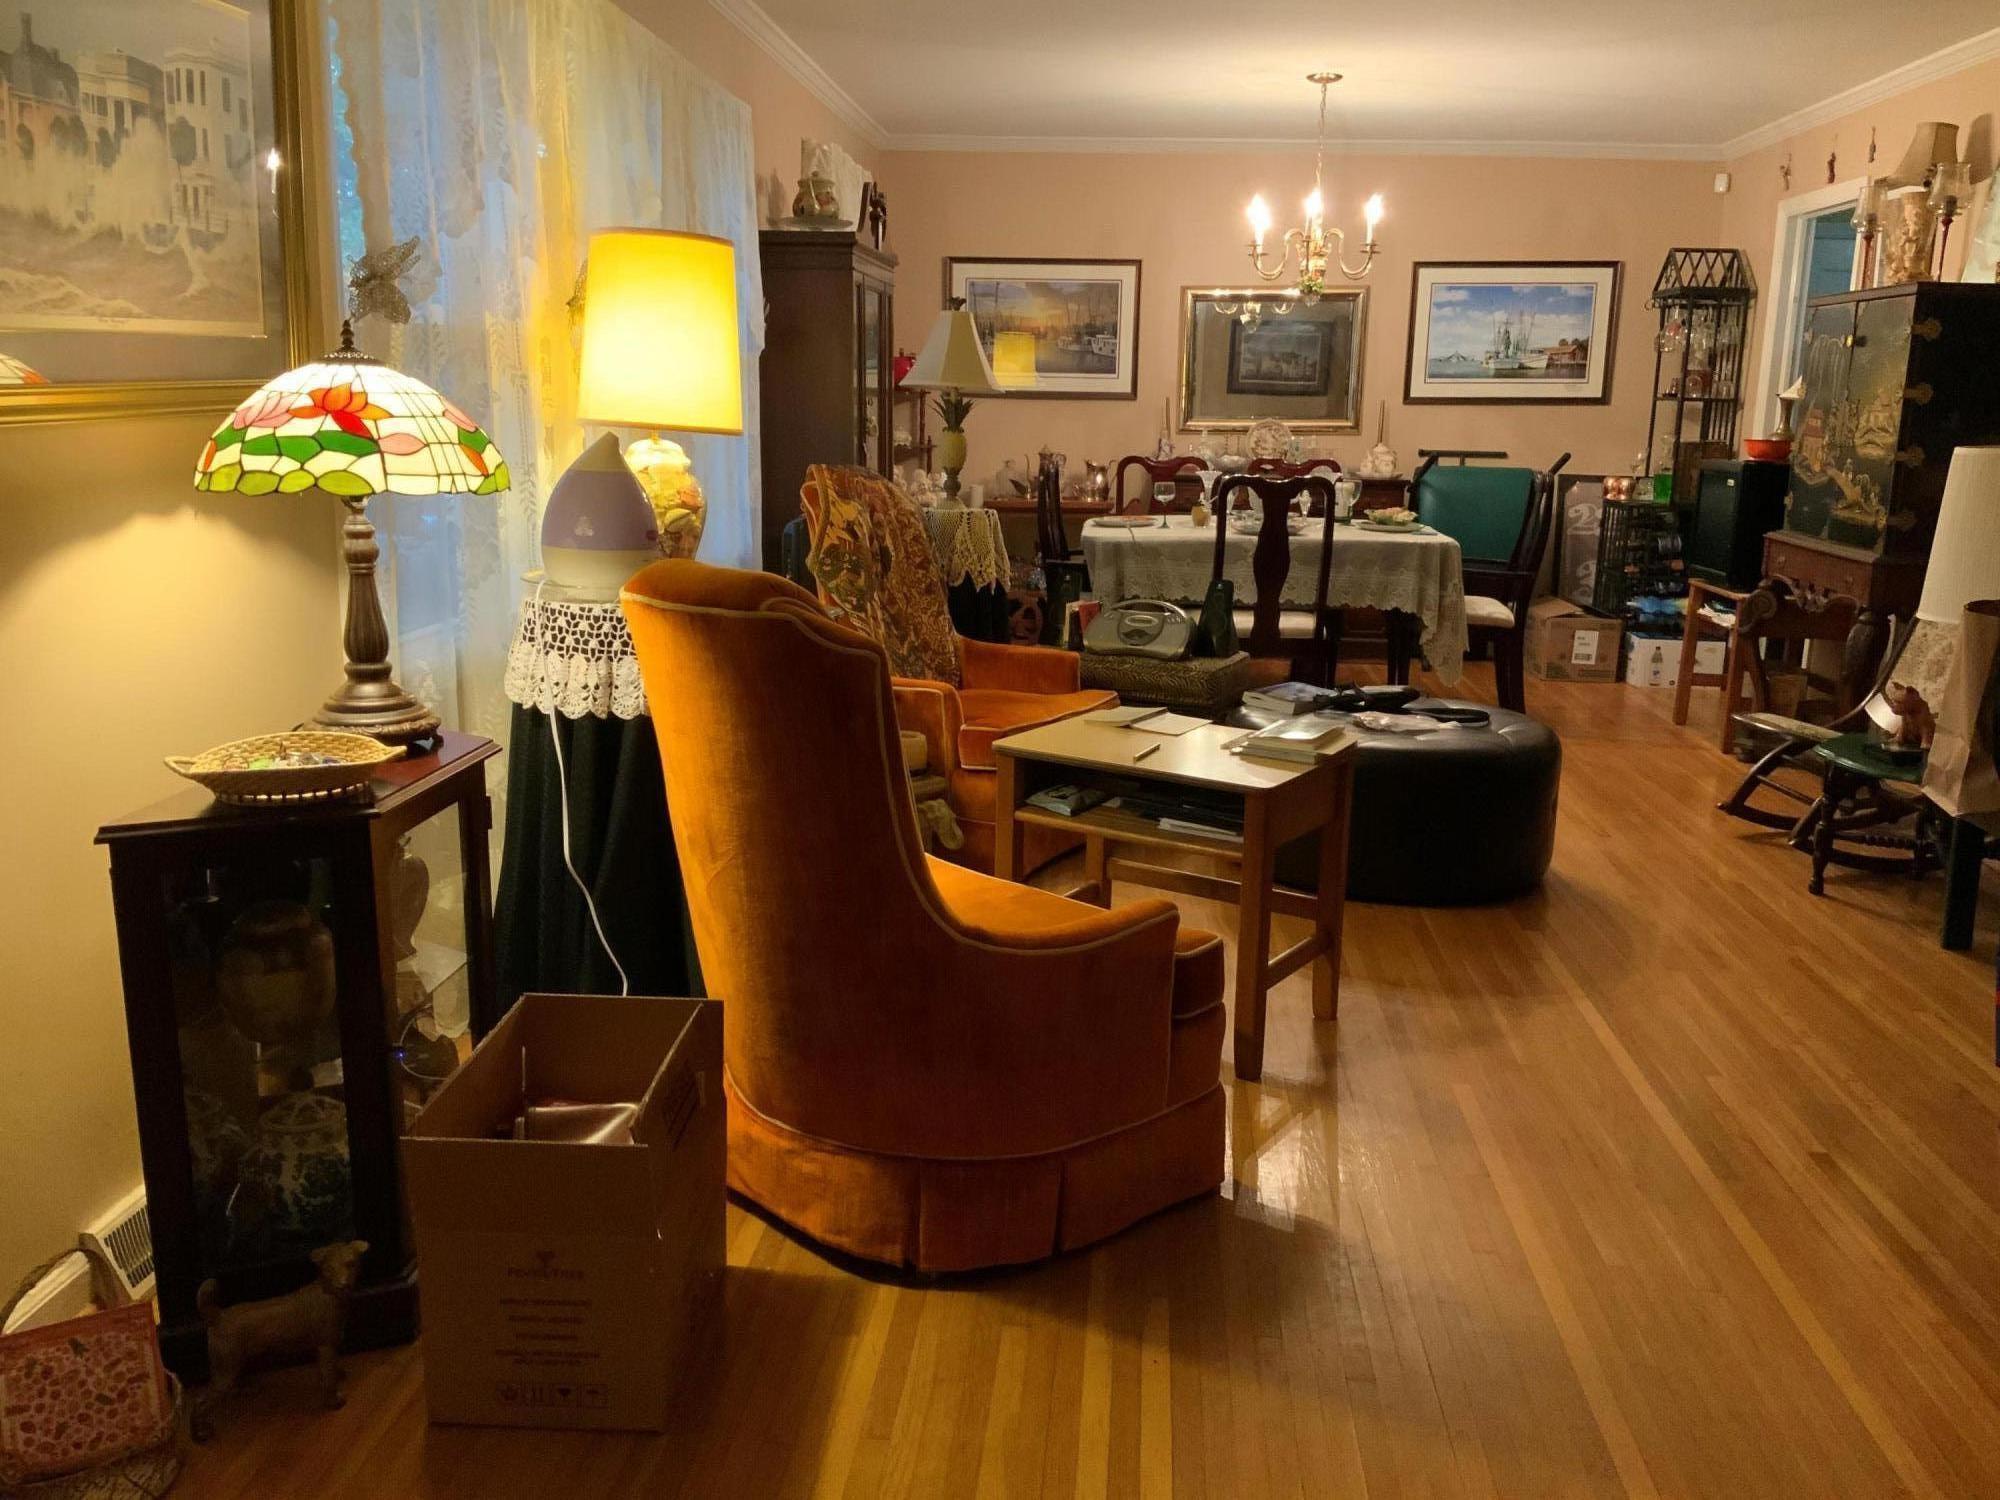 Northbridge Terrace Homes For Sale - 1156 Northbridge, Charleston, SC - 7